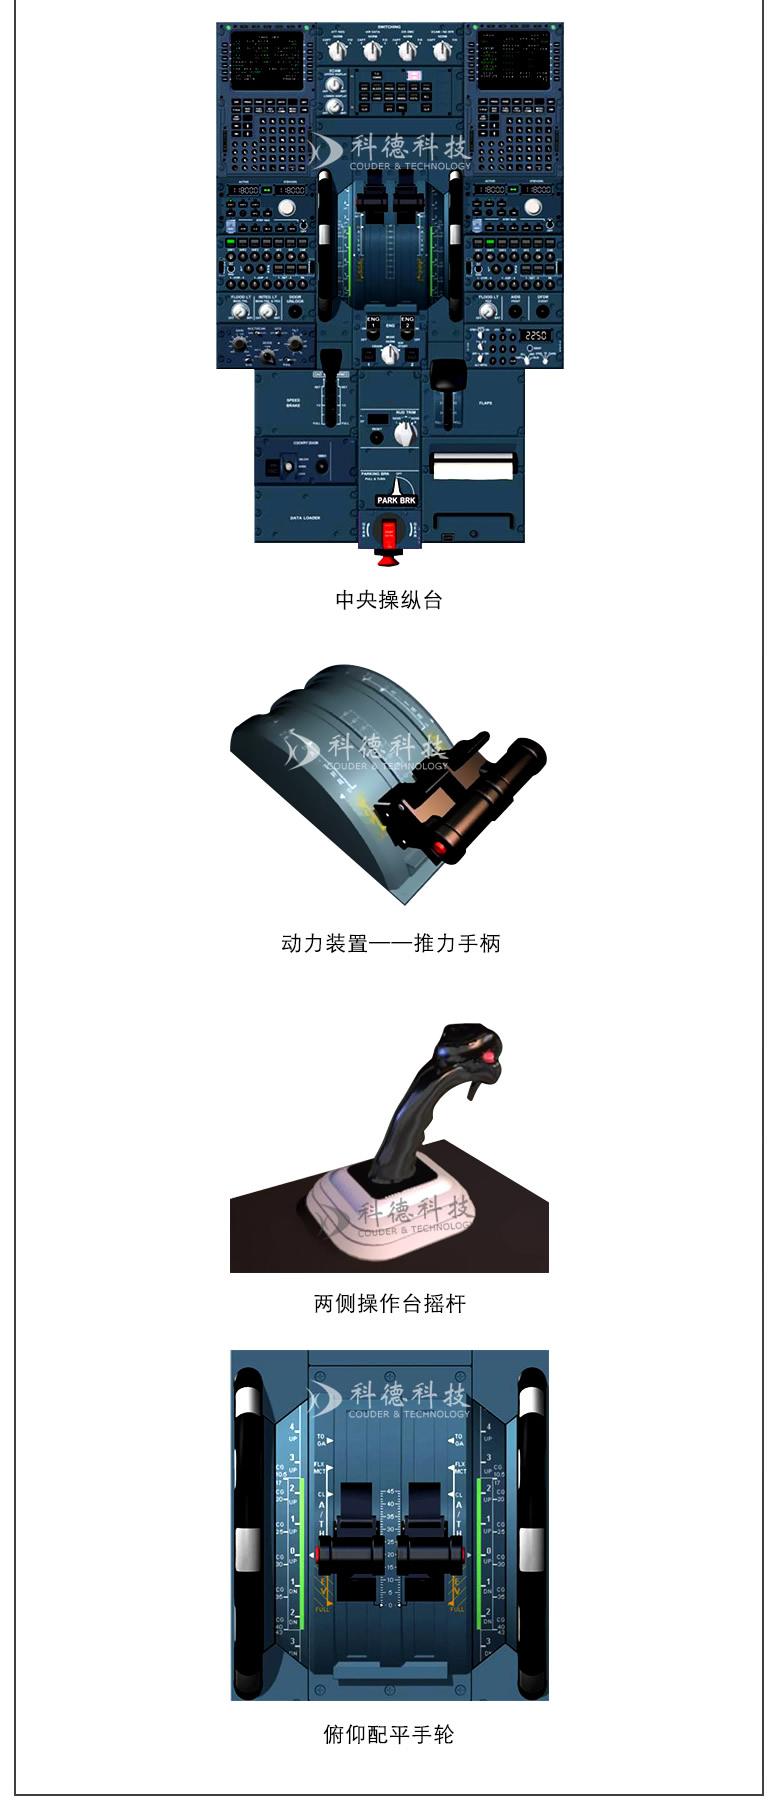 18dj18大奖官网手机版